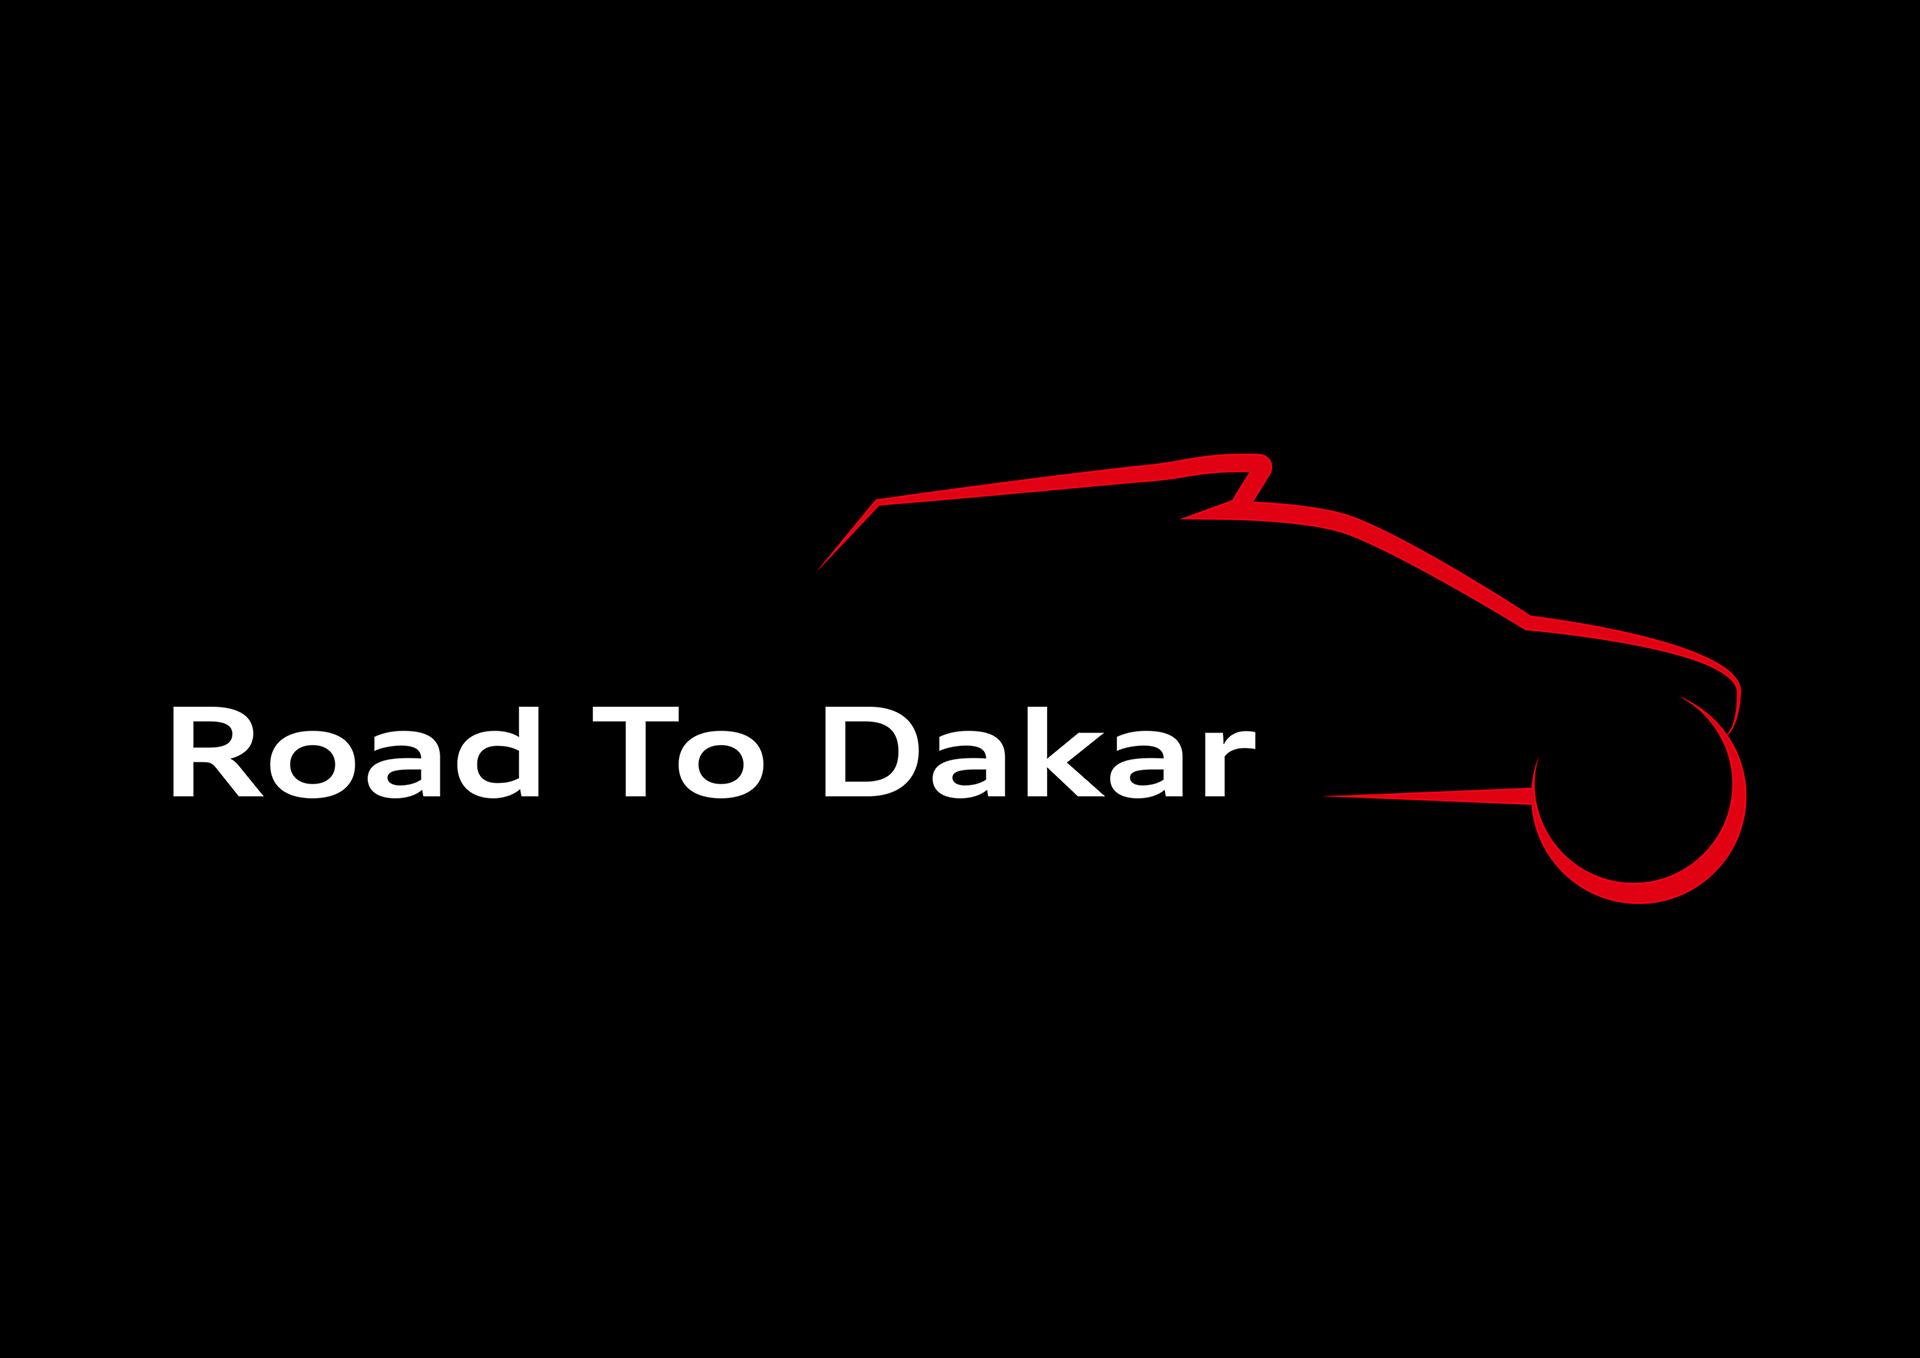 AUDI SPORT ROAD TO DAKAR LOGO Audi : Dream Team για «ηλεκτρική» νίκη στο Ράλι Ντακάρ Audi, Electric cars, electric vehicles, Rally Dakar, ειδήσεις, ηλεκτρικά, ηλεκτροκινηση, Νέα